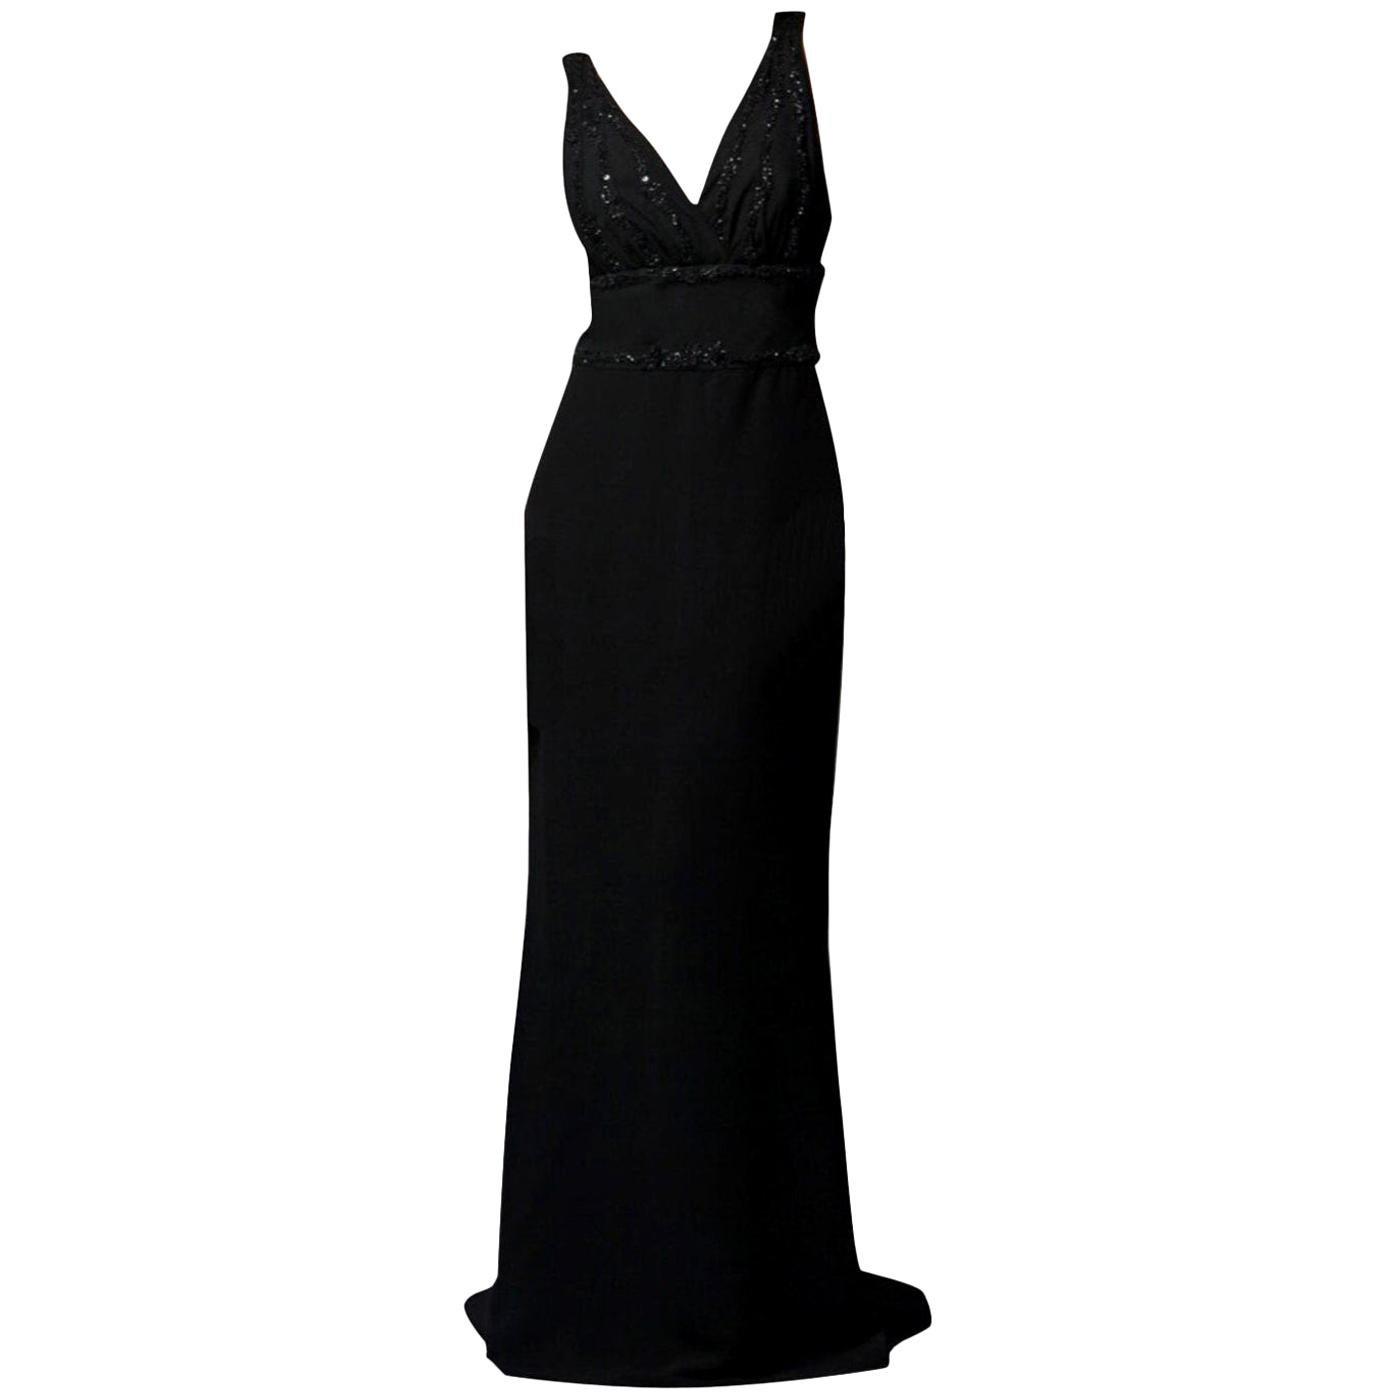 New Badgley Mischka Couture Beaded Evening Dress Gown Sz 4